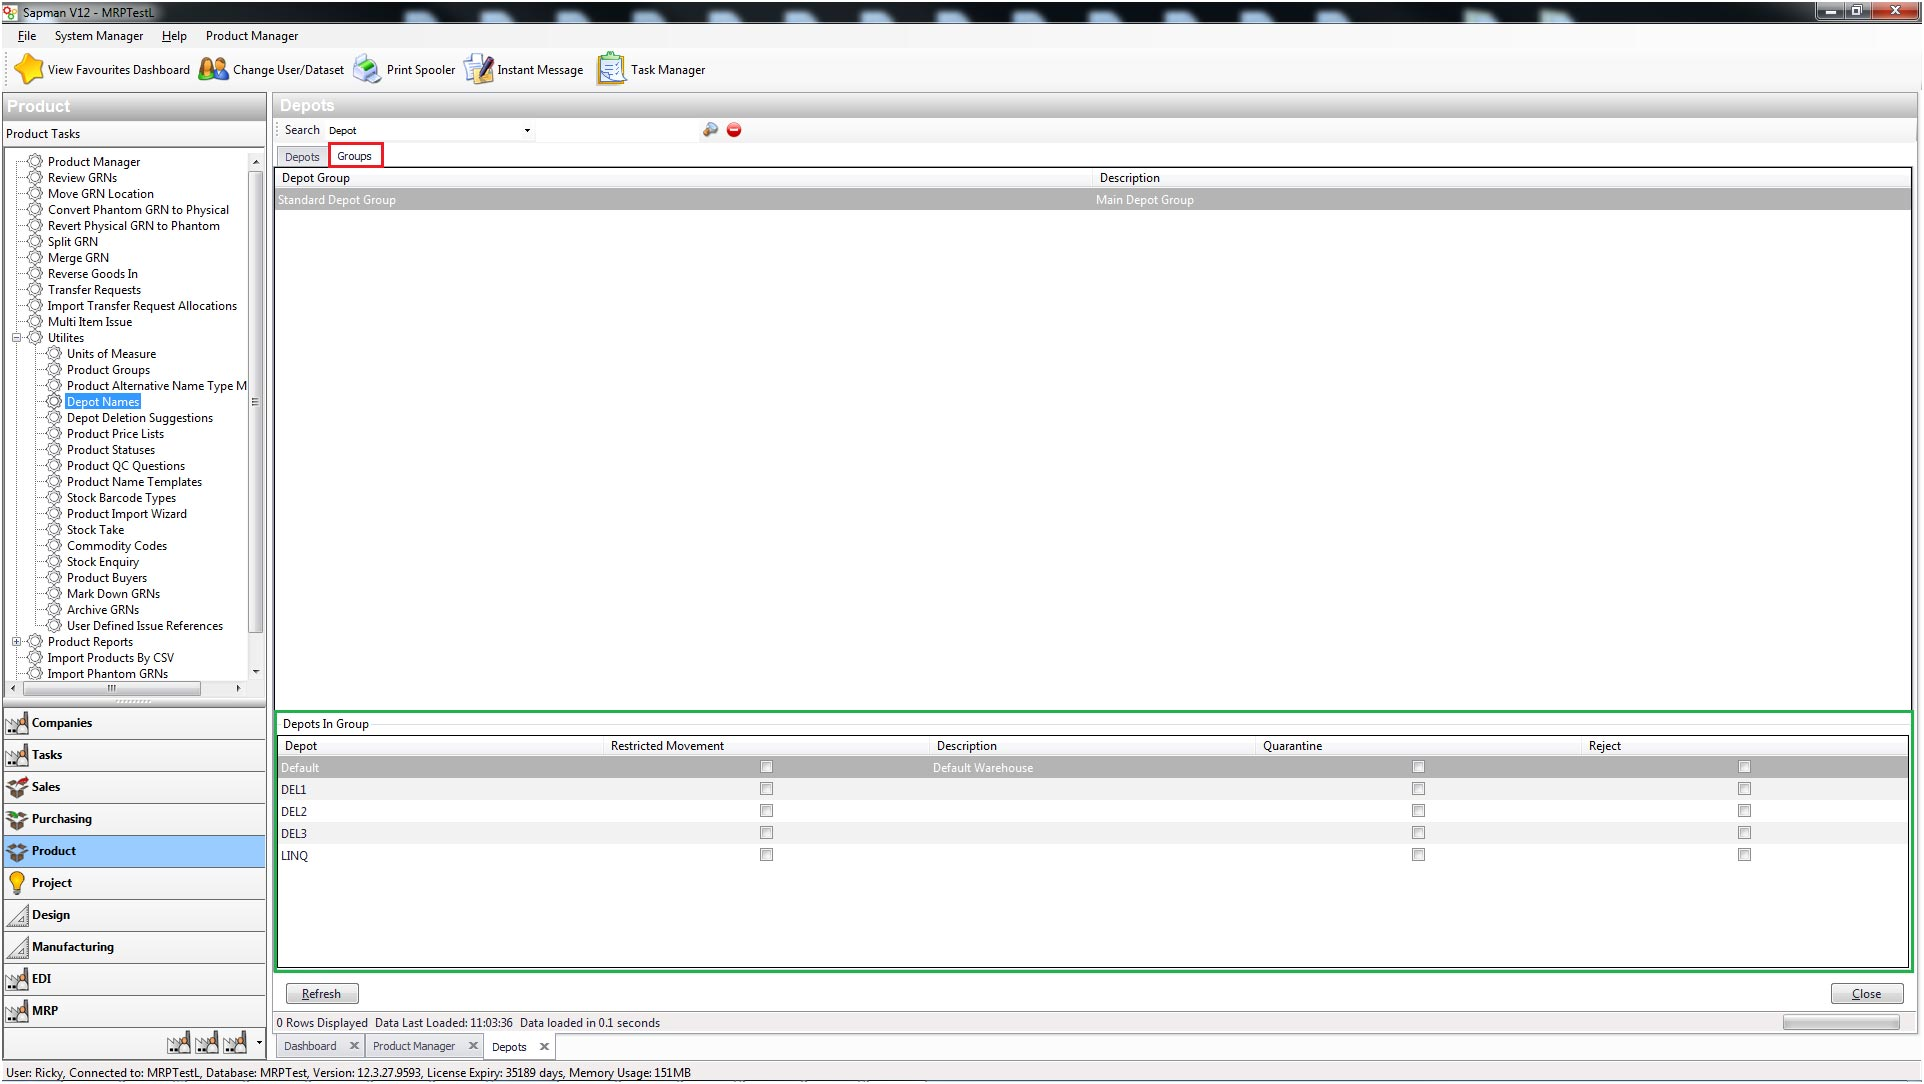 Sapman v12 Depot Manager screen